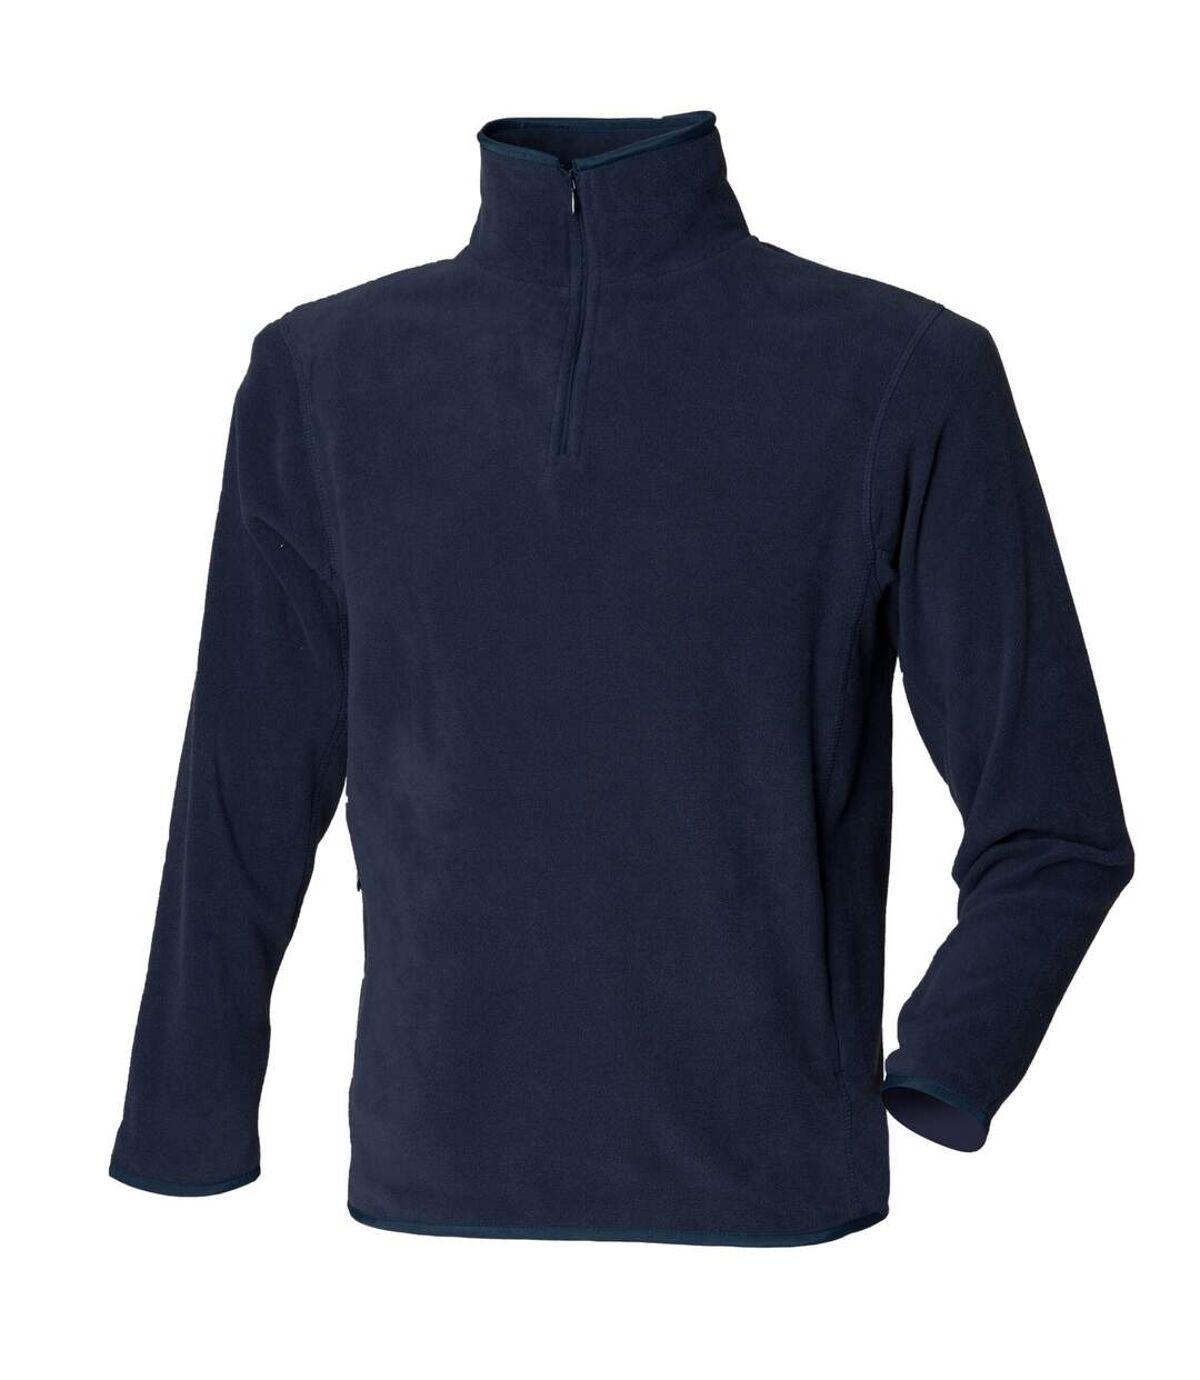 Henbury - Haut polaire à fermeture zippée - Homme (Bleu marine) - UTRW680